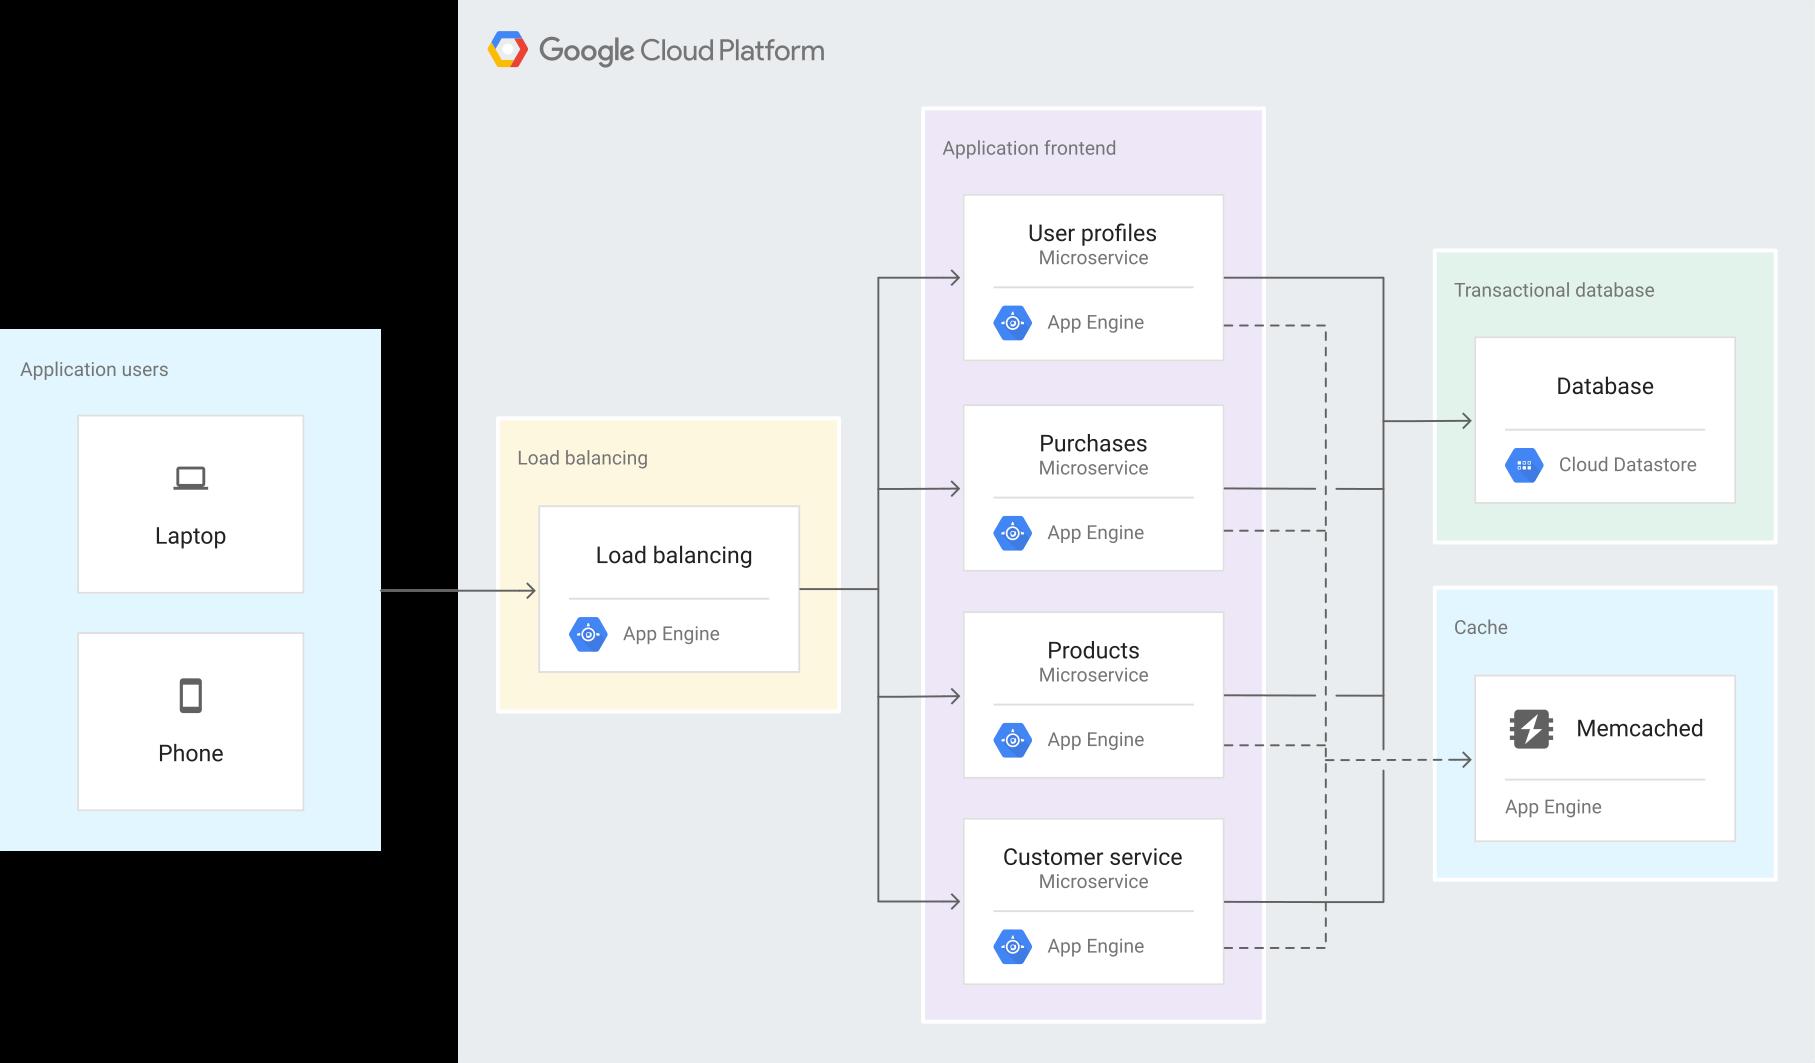 Arquitectura: Microservicios con AppEngine